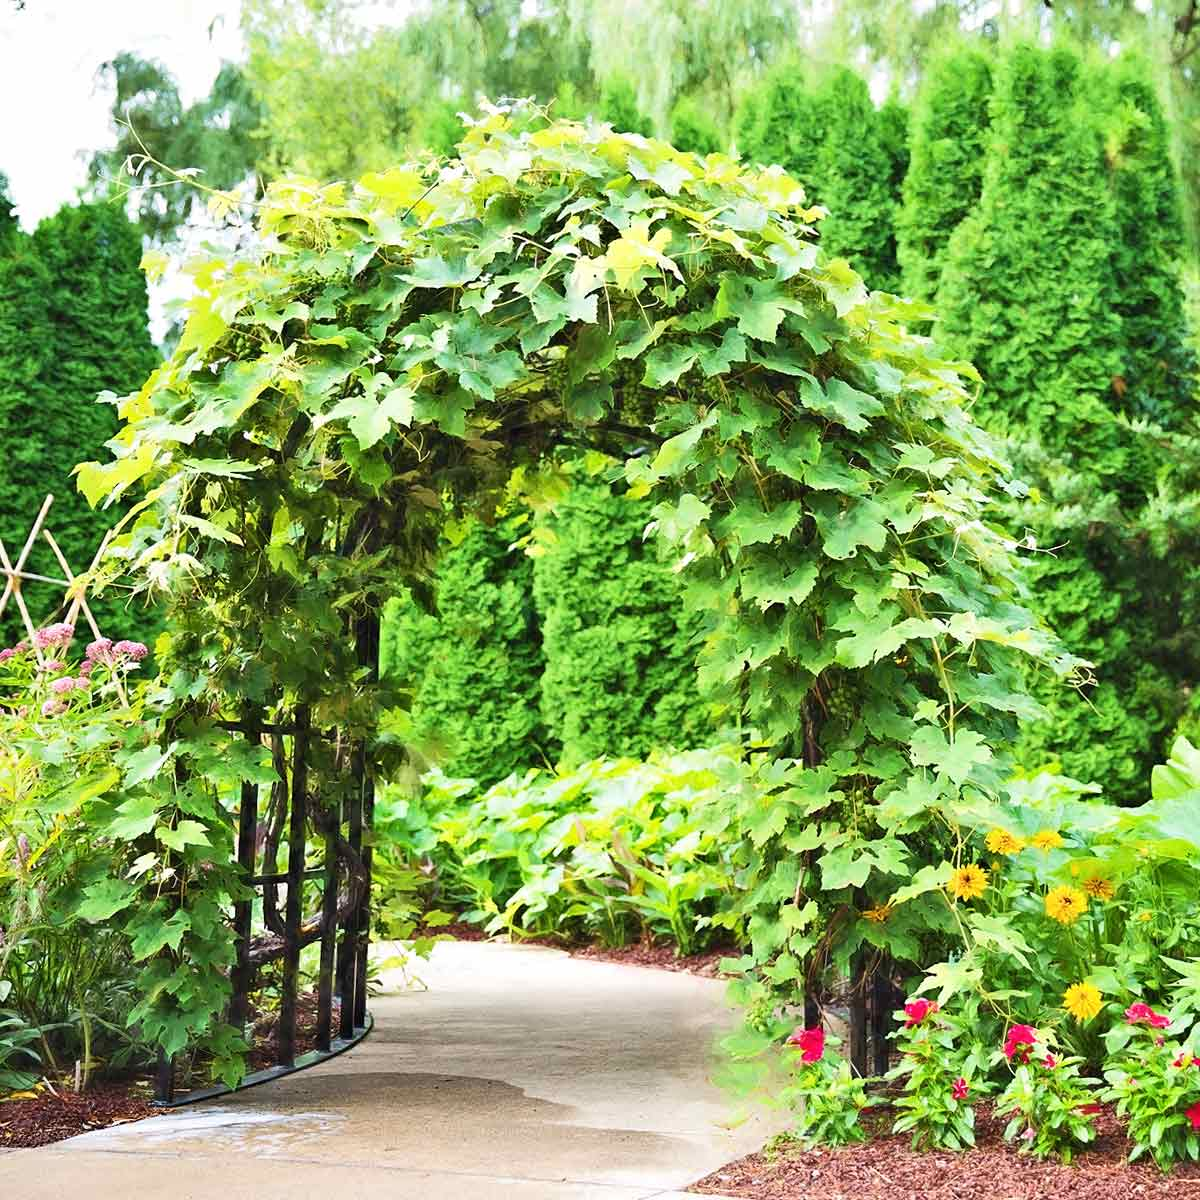 Aménagement Jardin Pas Cher aménagement jardin et terrasse | jardins-animes